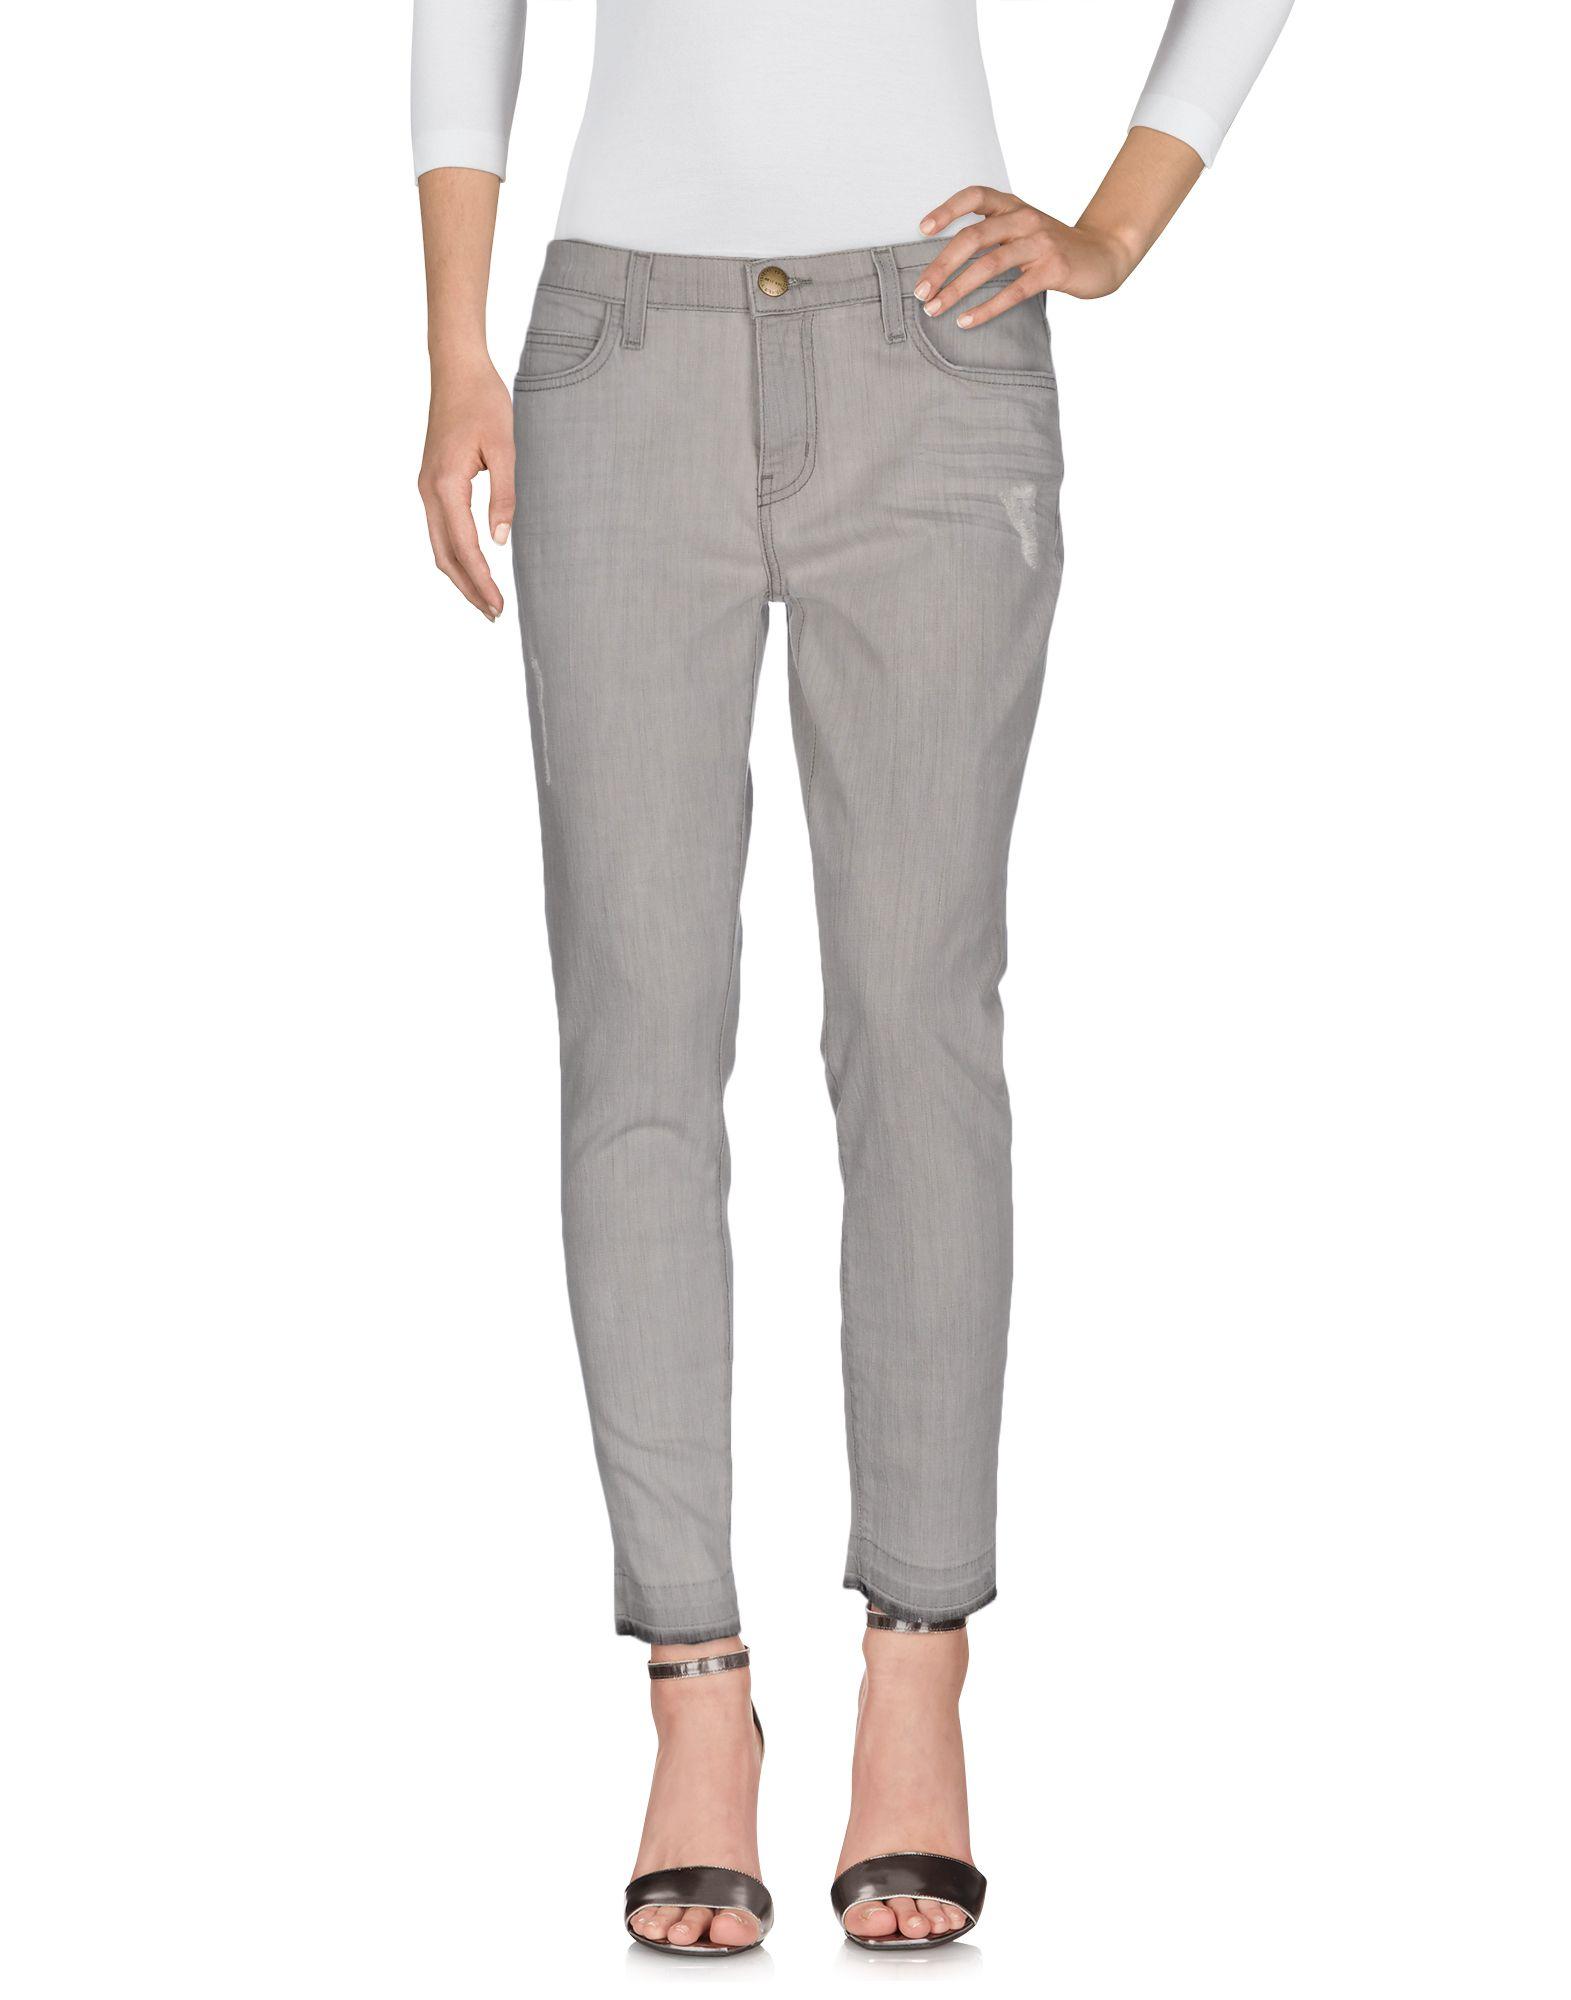 Pantaloni Jeans Current/Elliott Donna - Acquista online su Q9S9XA